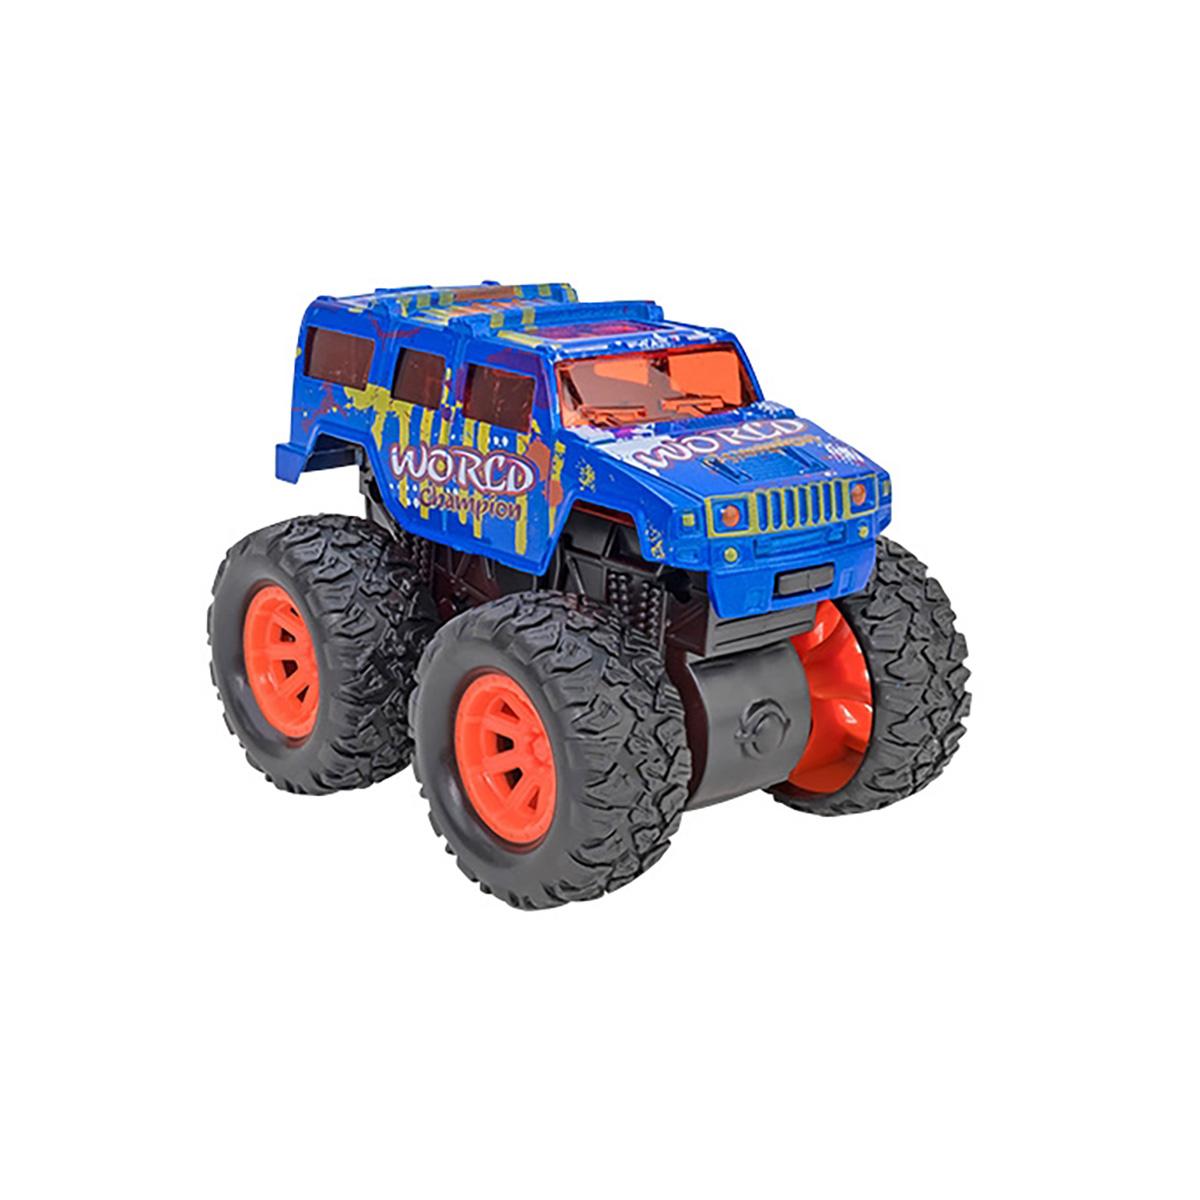 Masinuta Monster Truck Globo Die Cast, Albastru